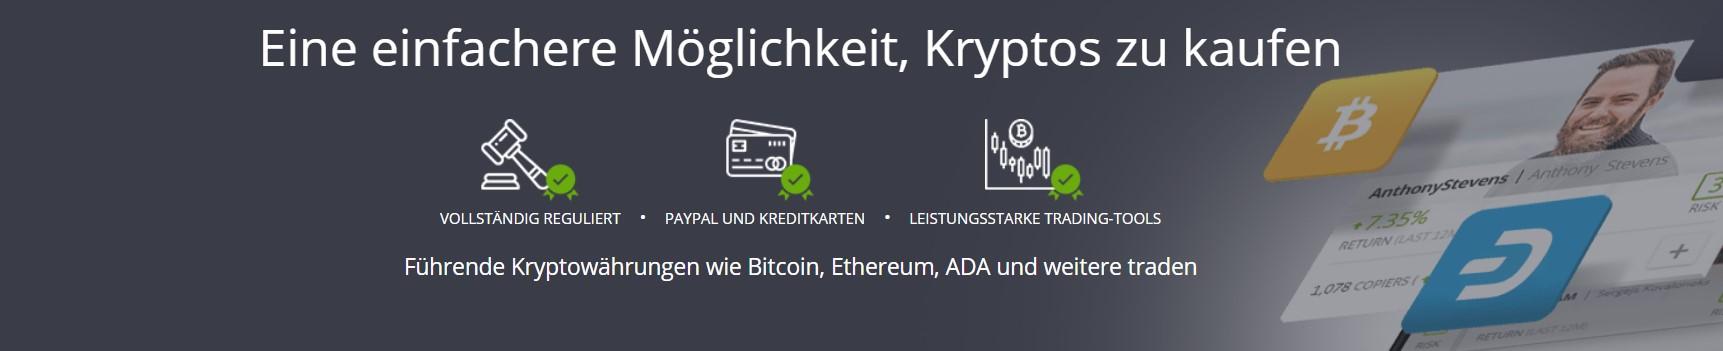 etoro gebühren bitcoin